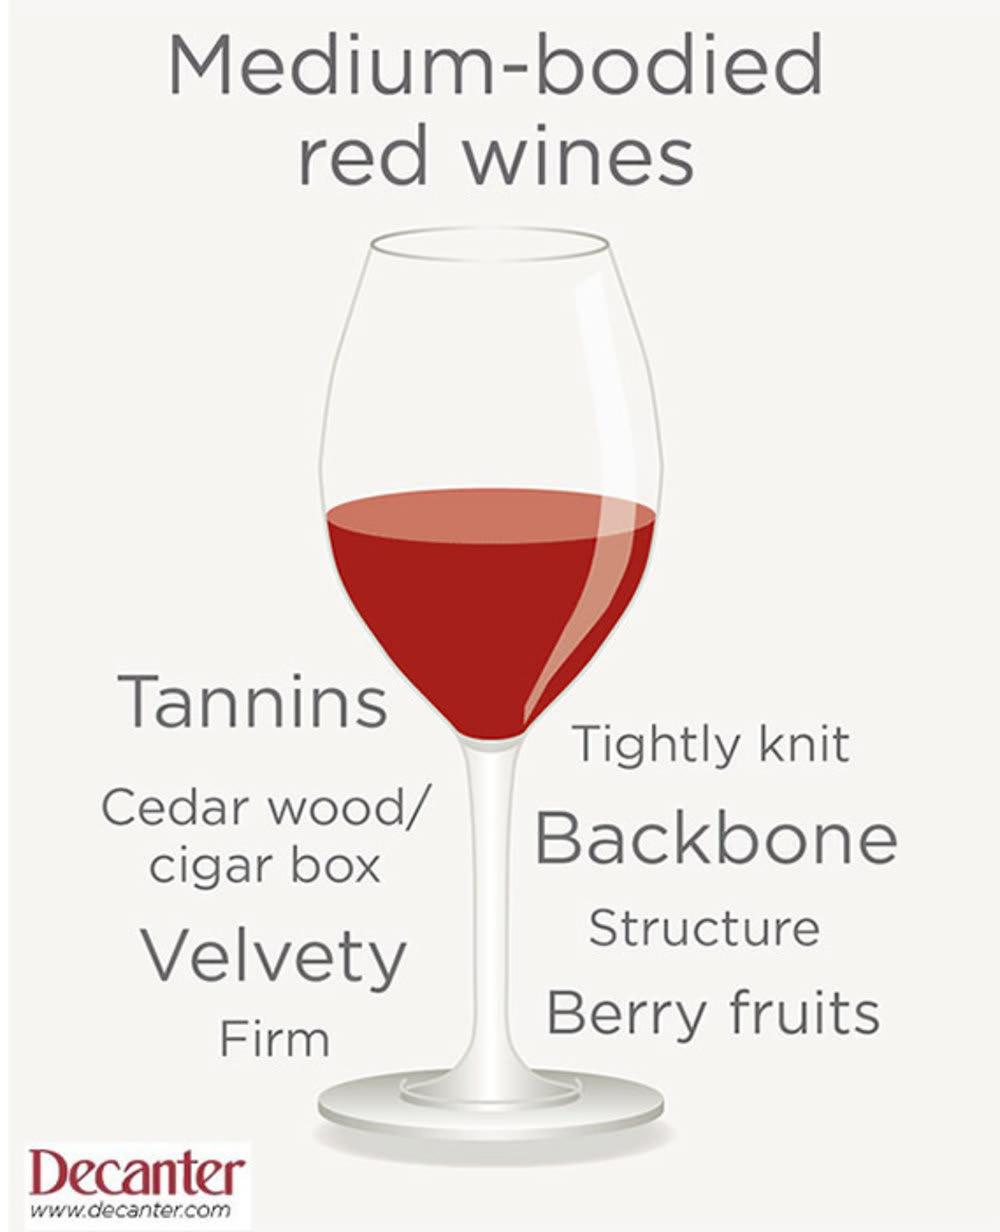 Medium-bodied red wines